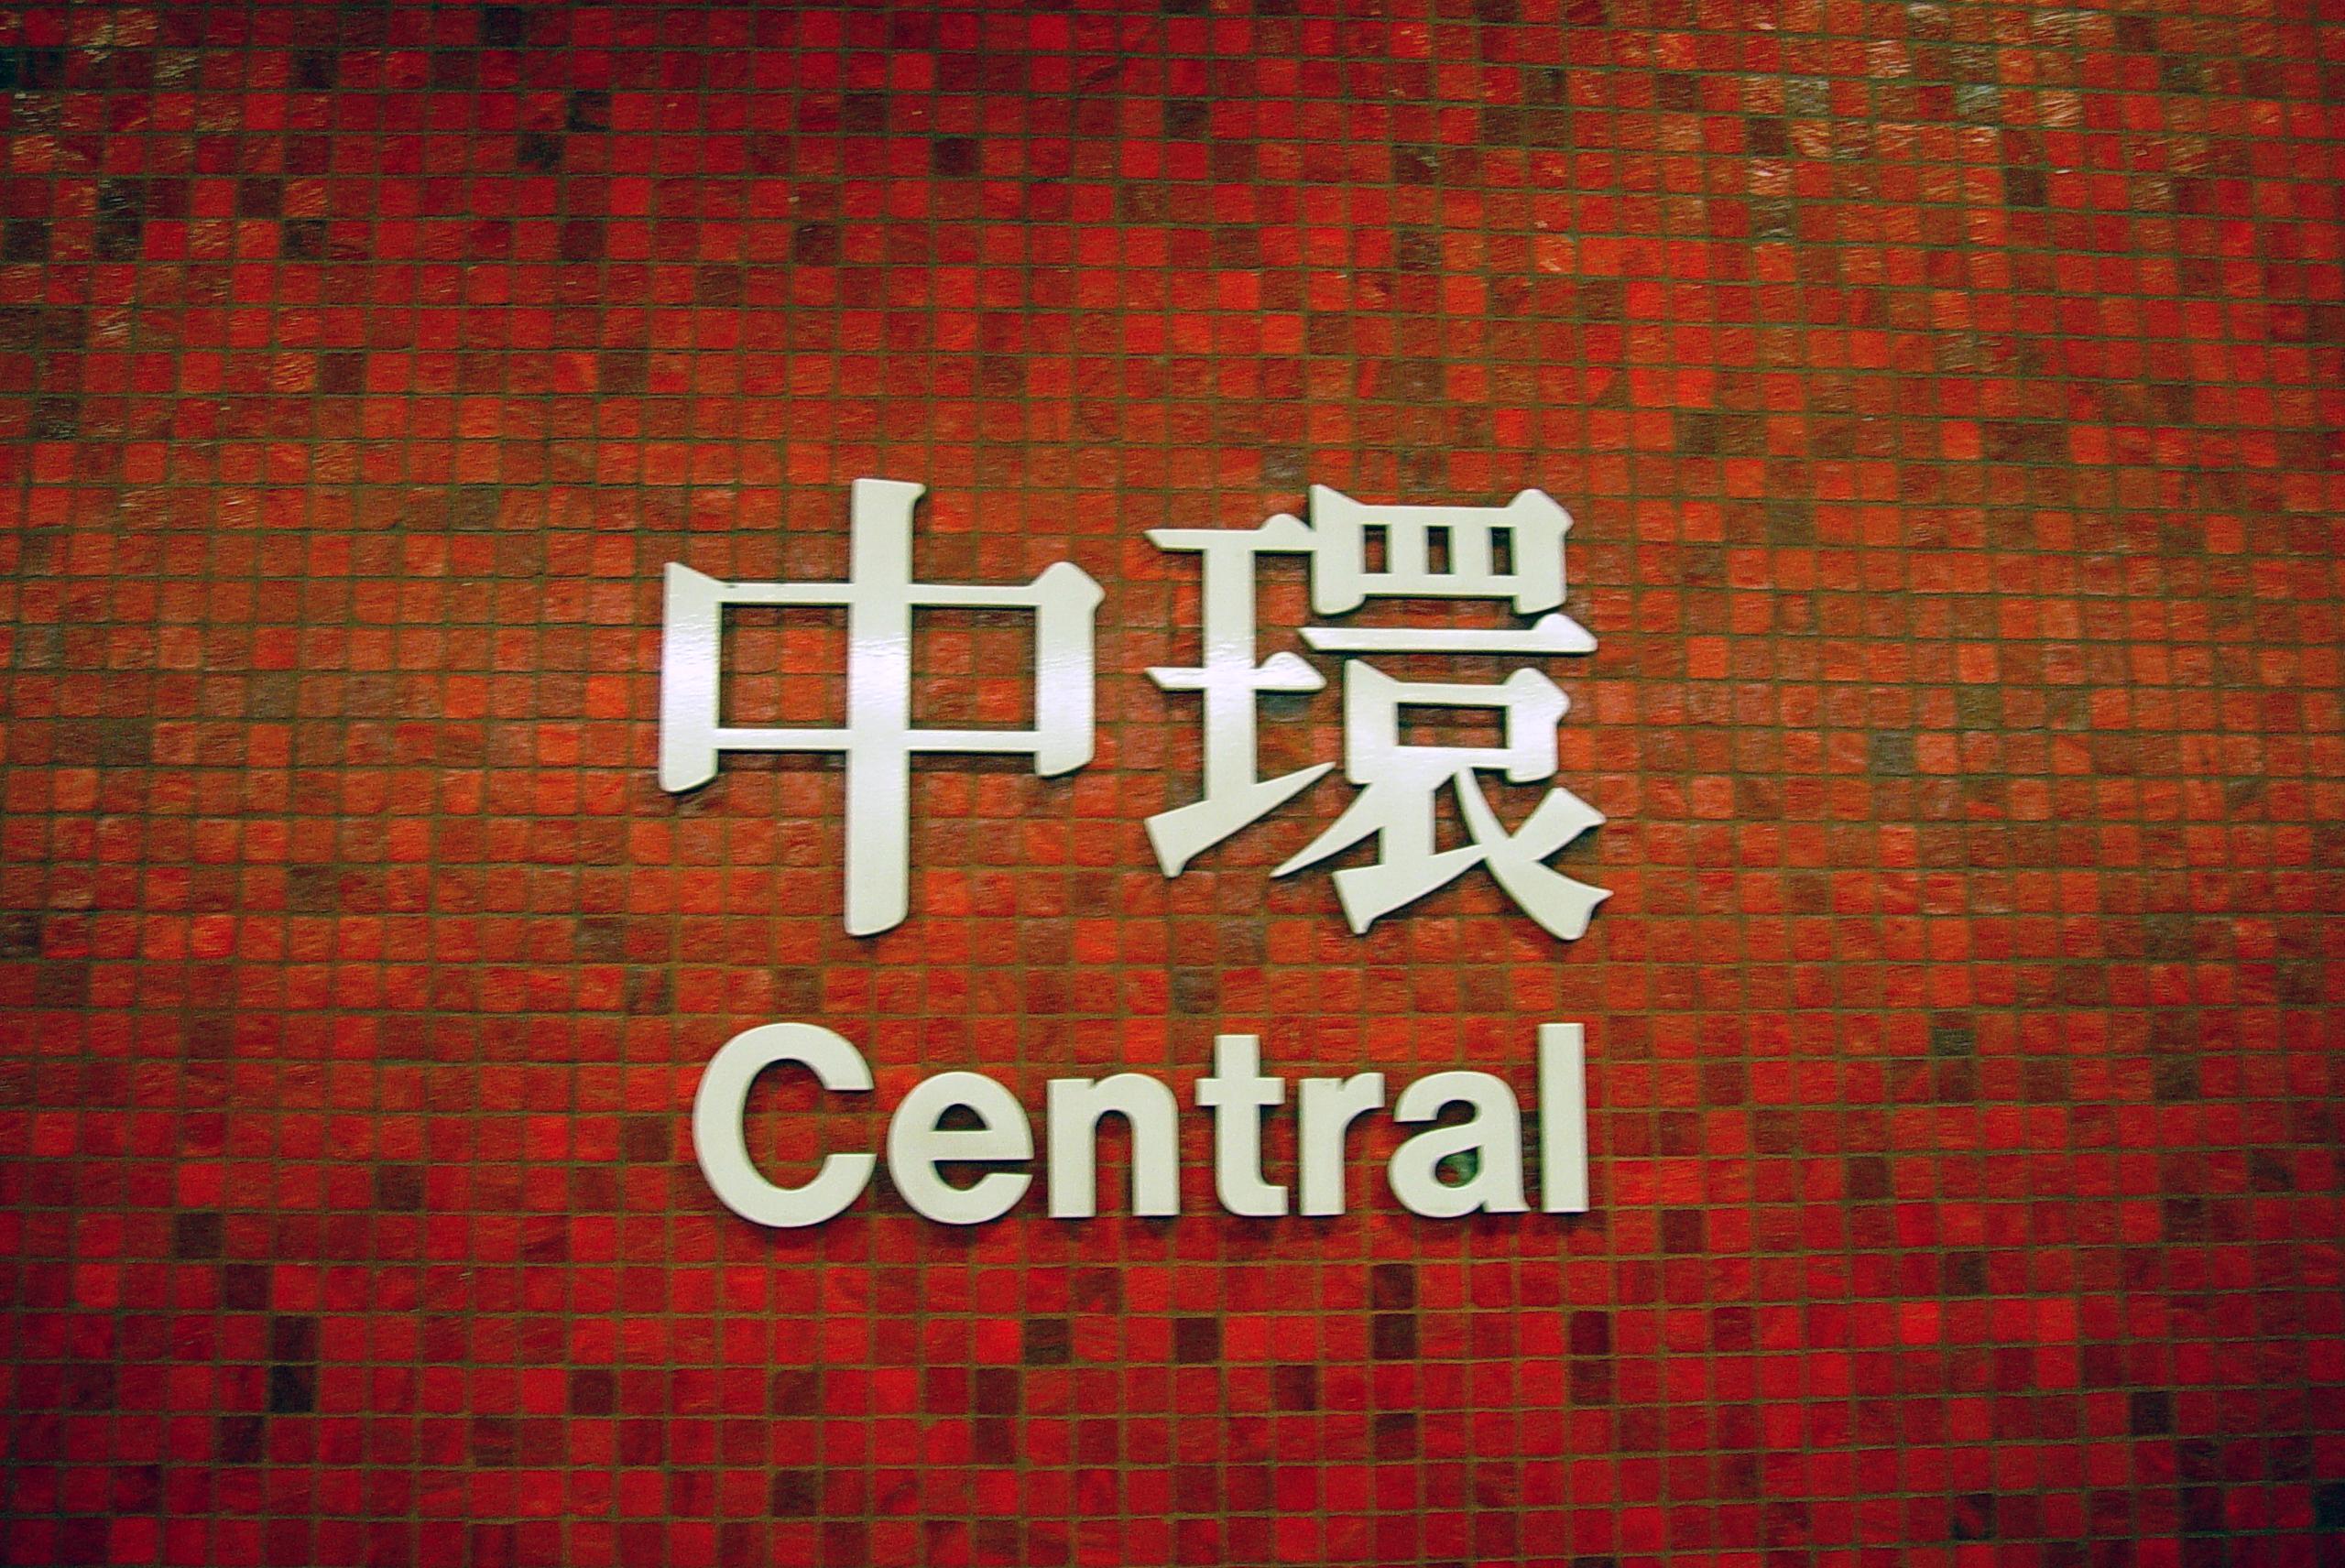 file mtr hong kong station central jpg wikimedia commons